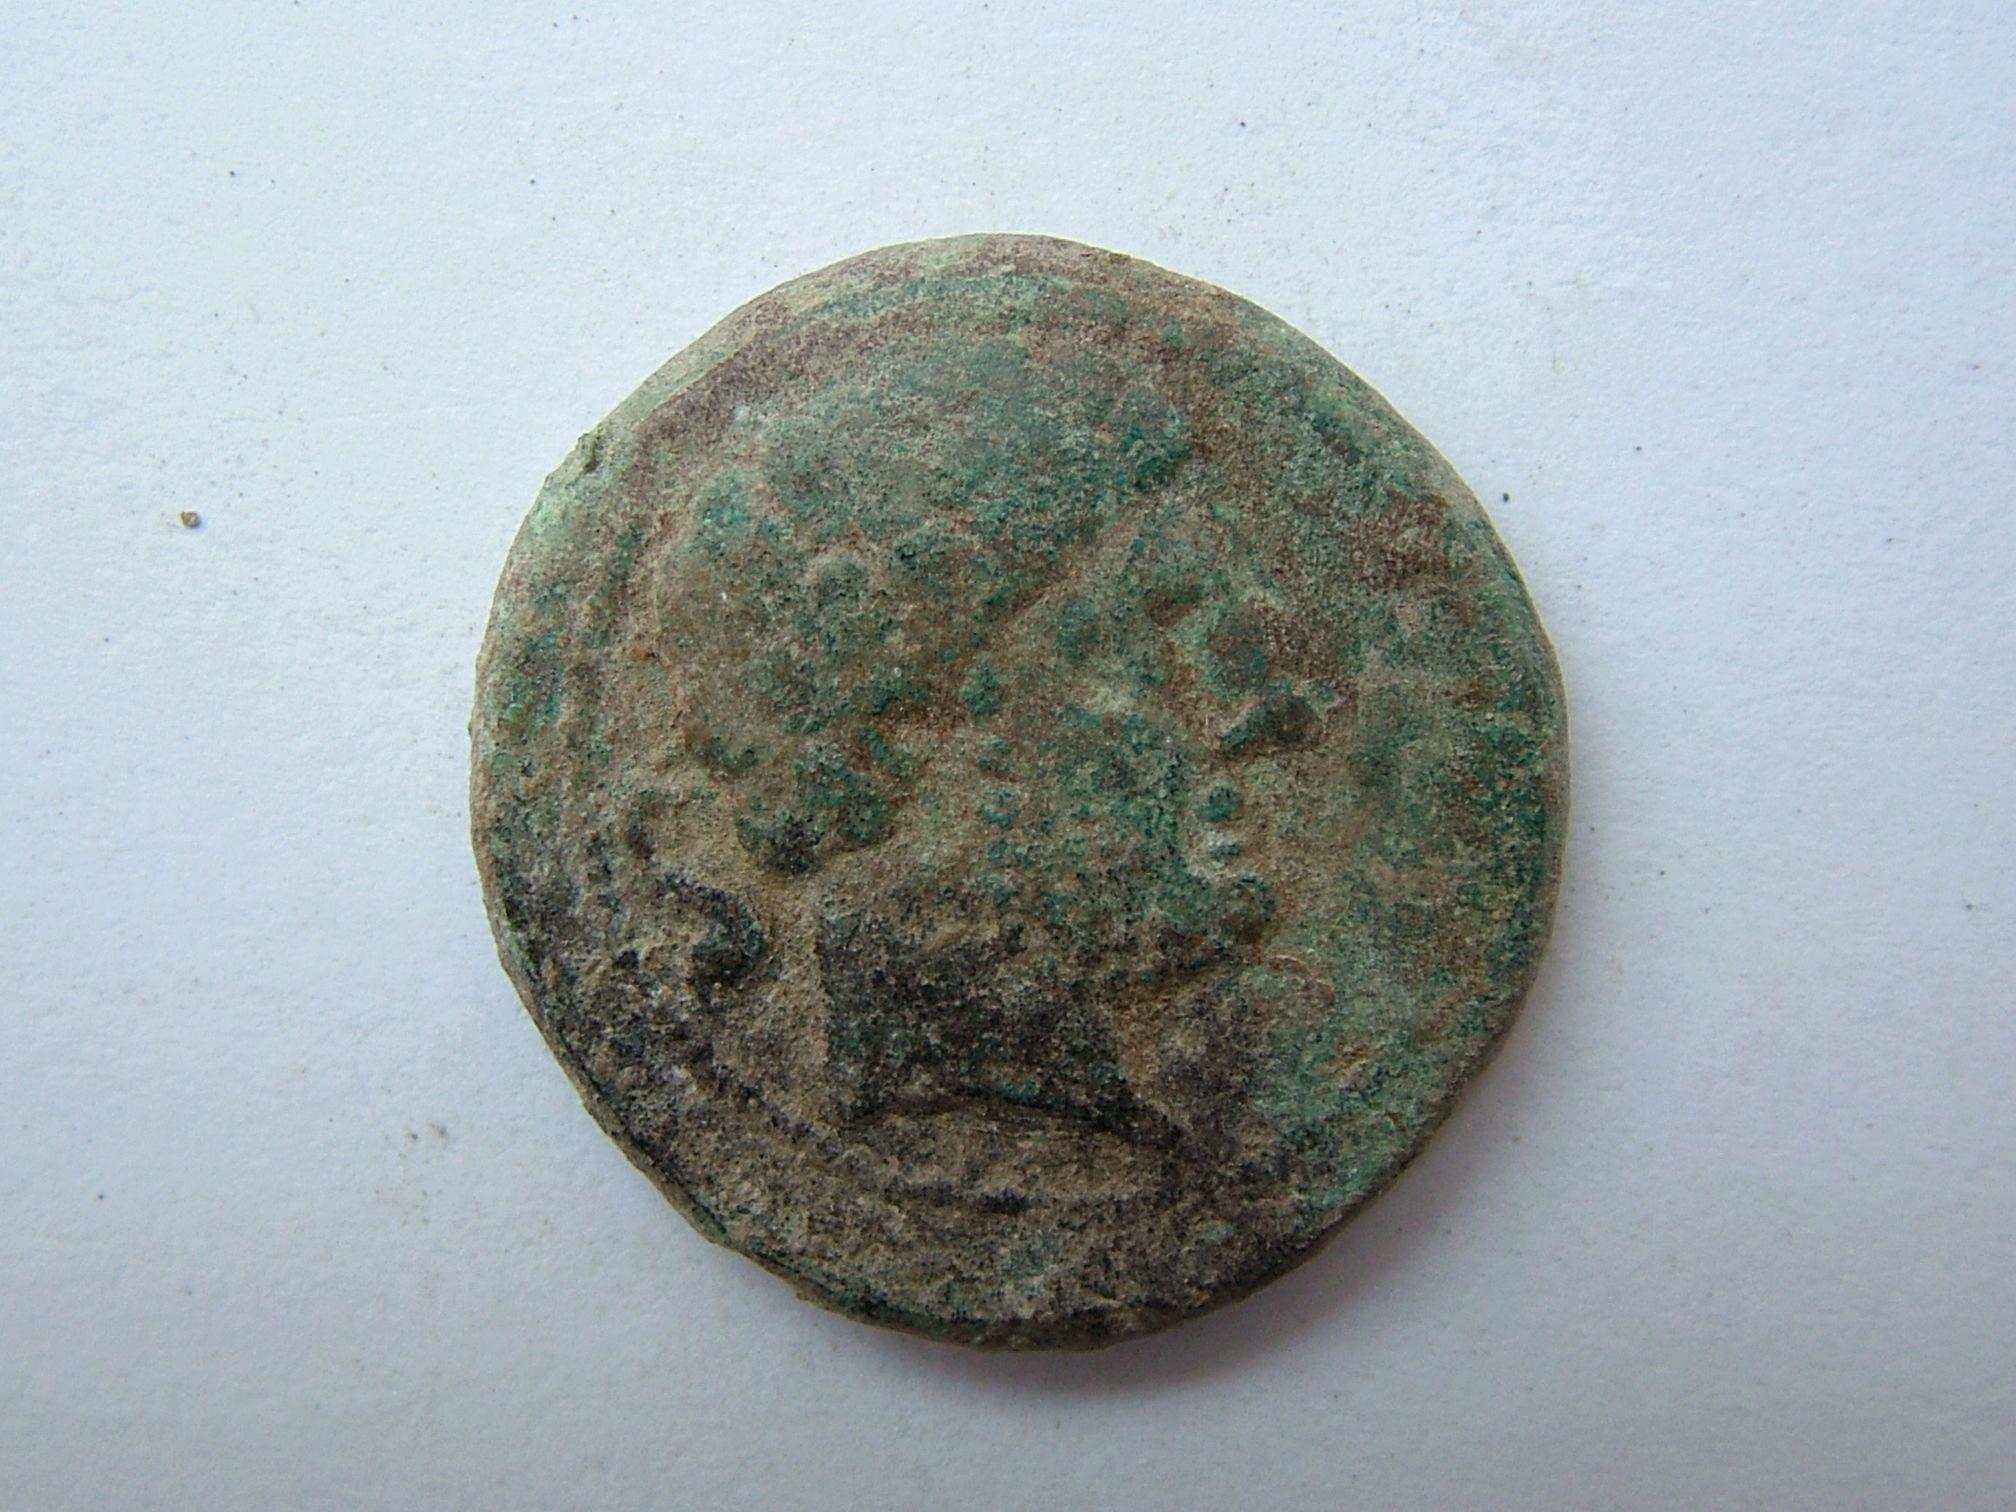 Imágenes a gran escala de pátinas y monedas falsas. Escalofriante (+18). 04_bol10